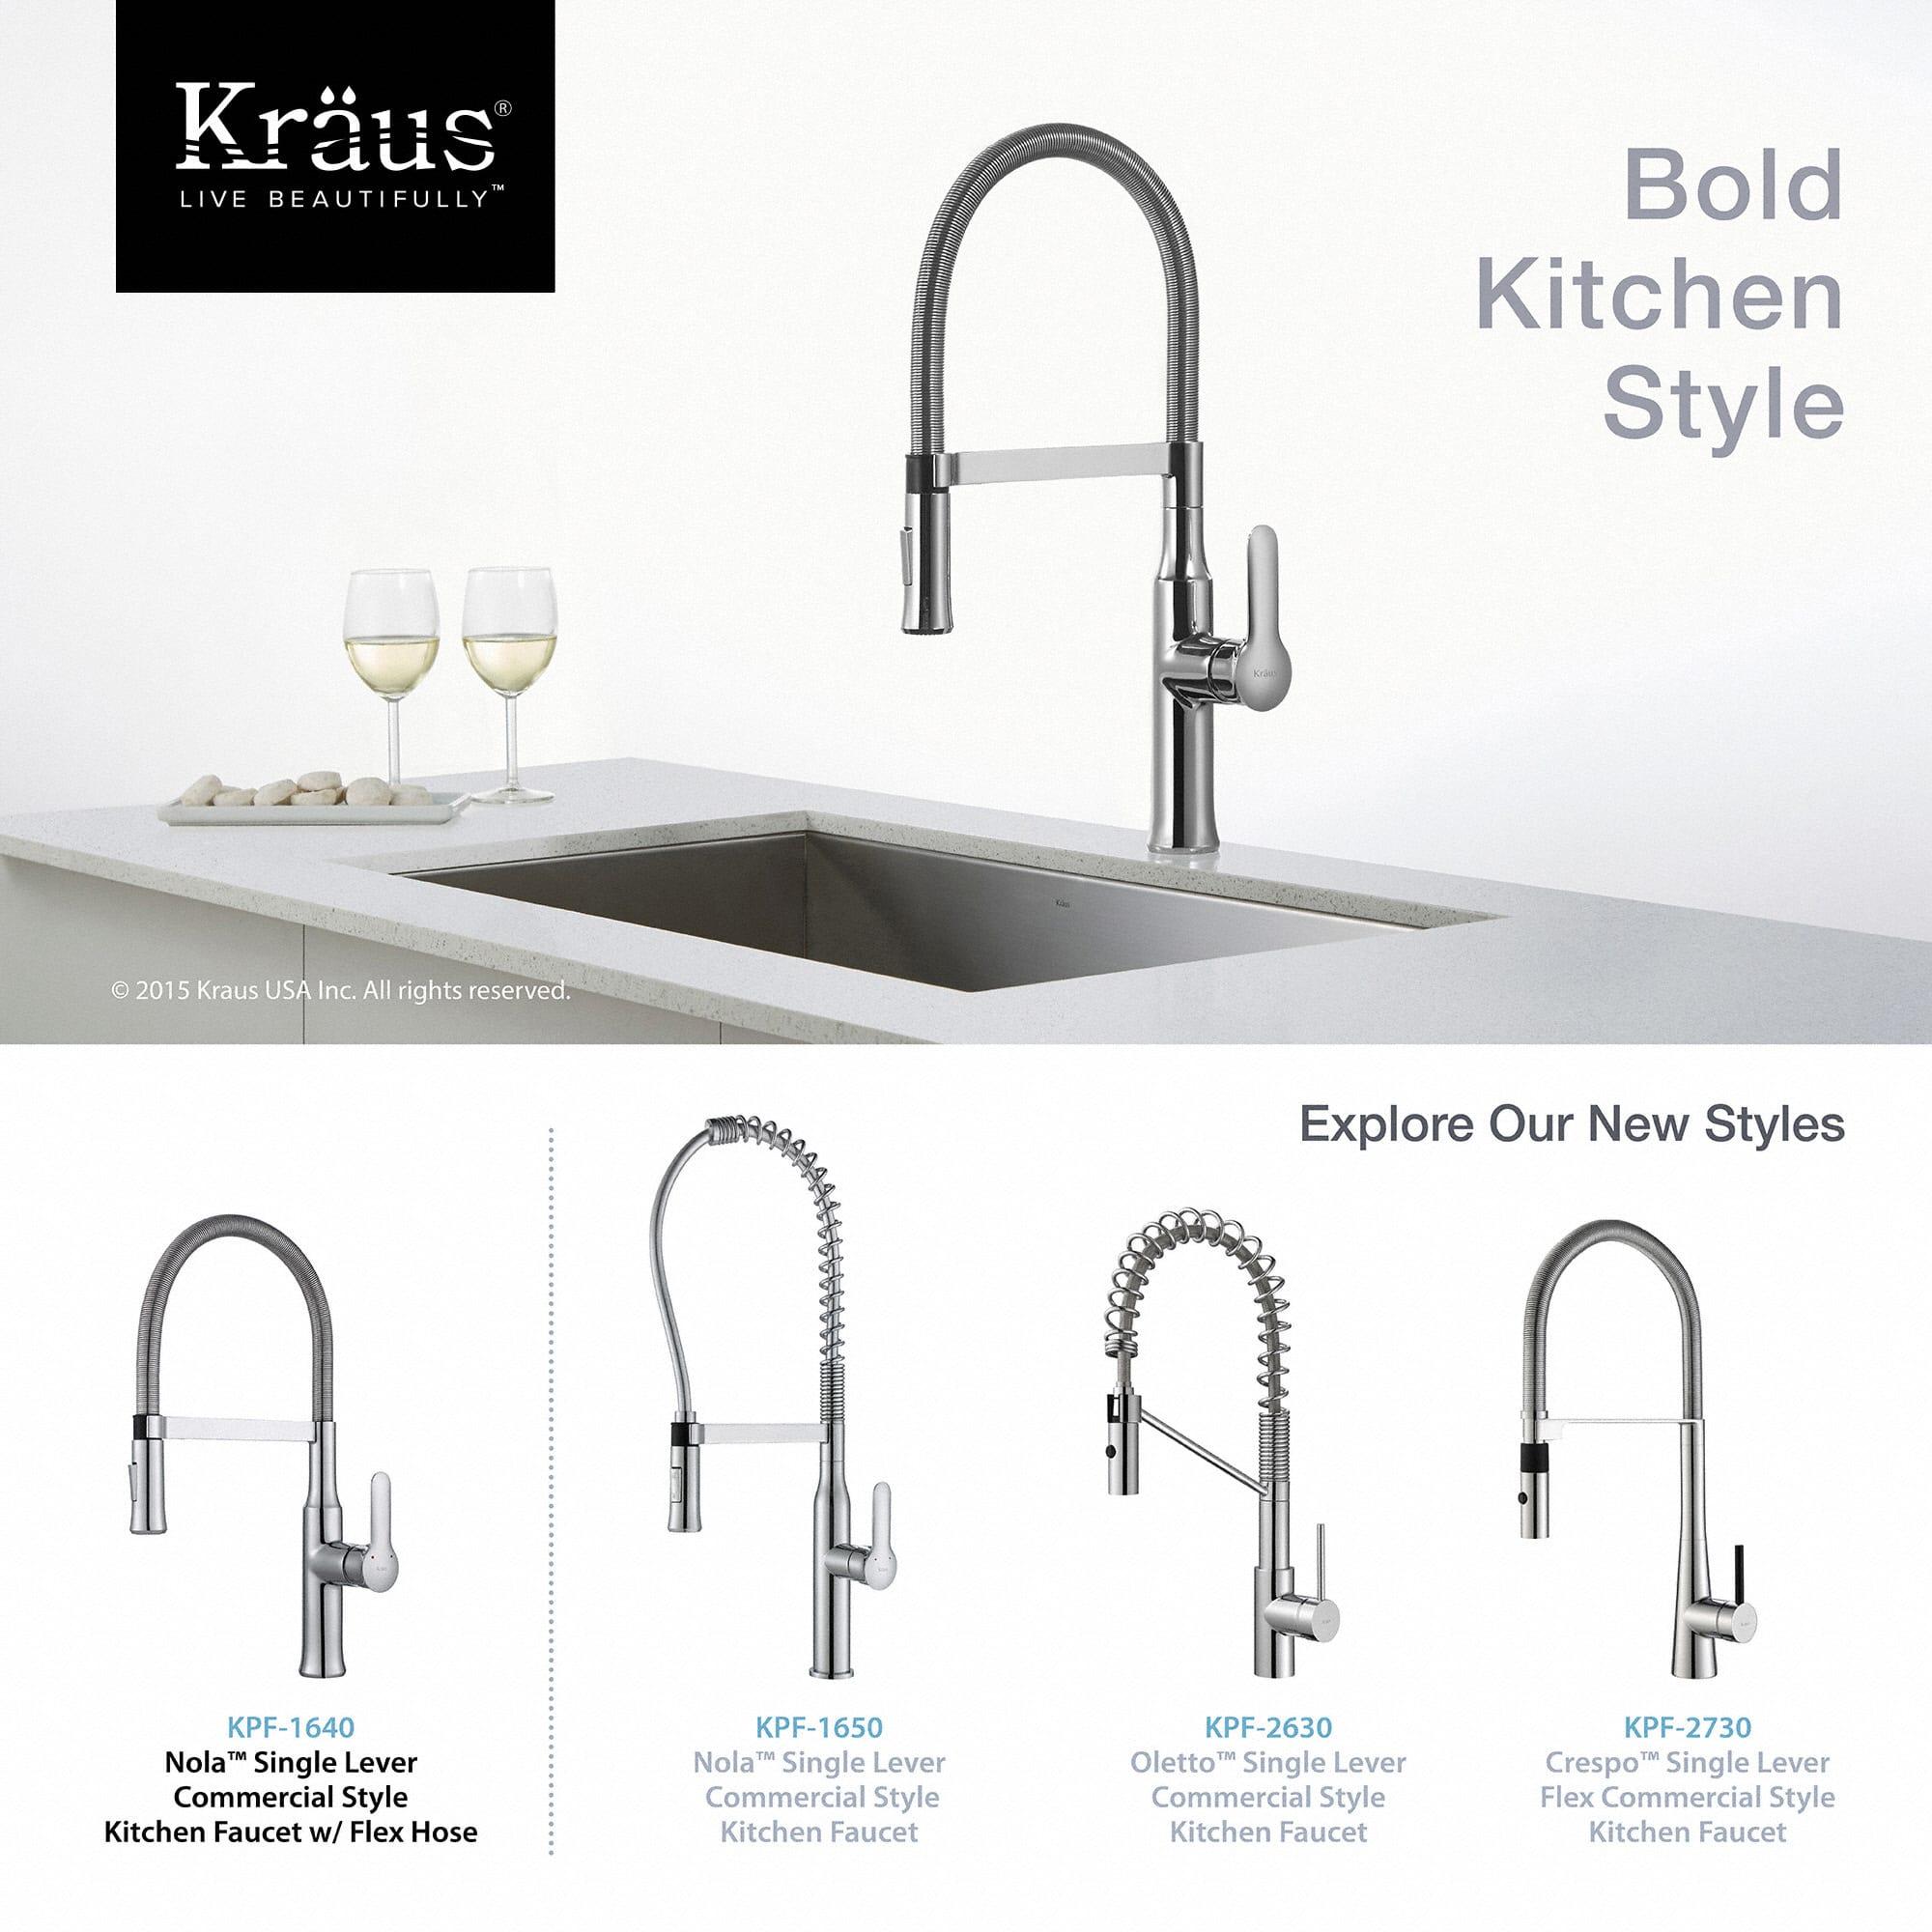 Kraus KPF 1640SS Stainless Steel Nola Single Lever Flex Commercial Style Kitchen  Faucet   Faucet.com